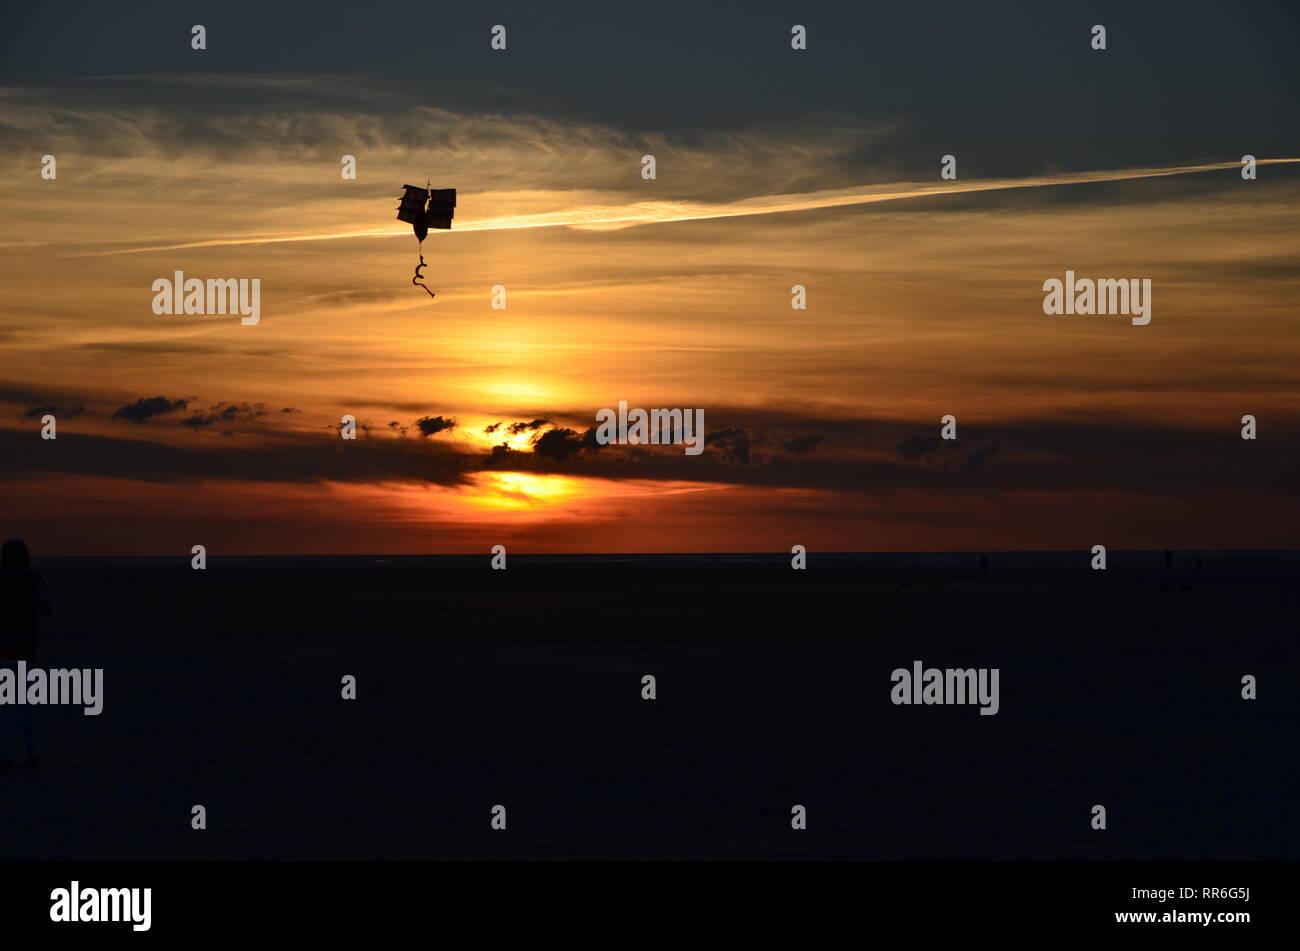 Sonnenuntergang mit Drachen Stock Photo